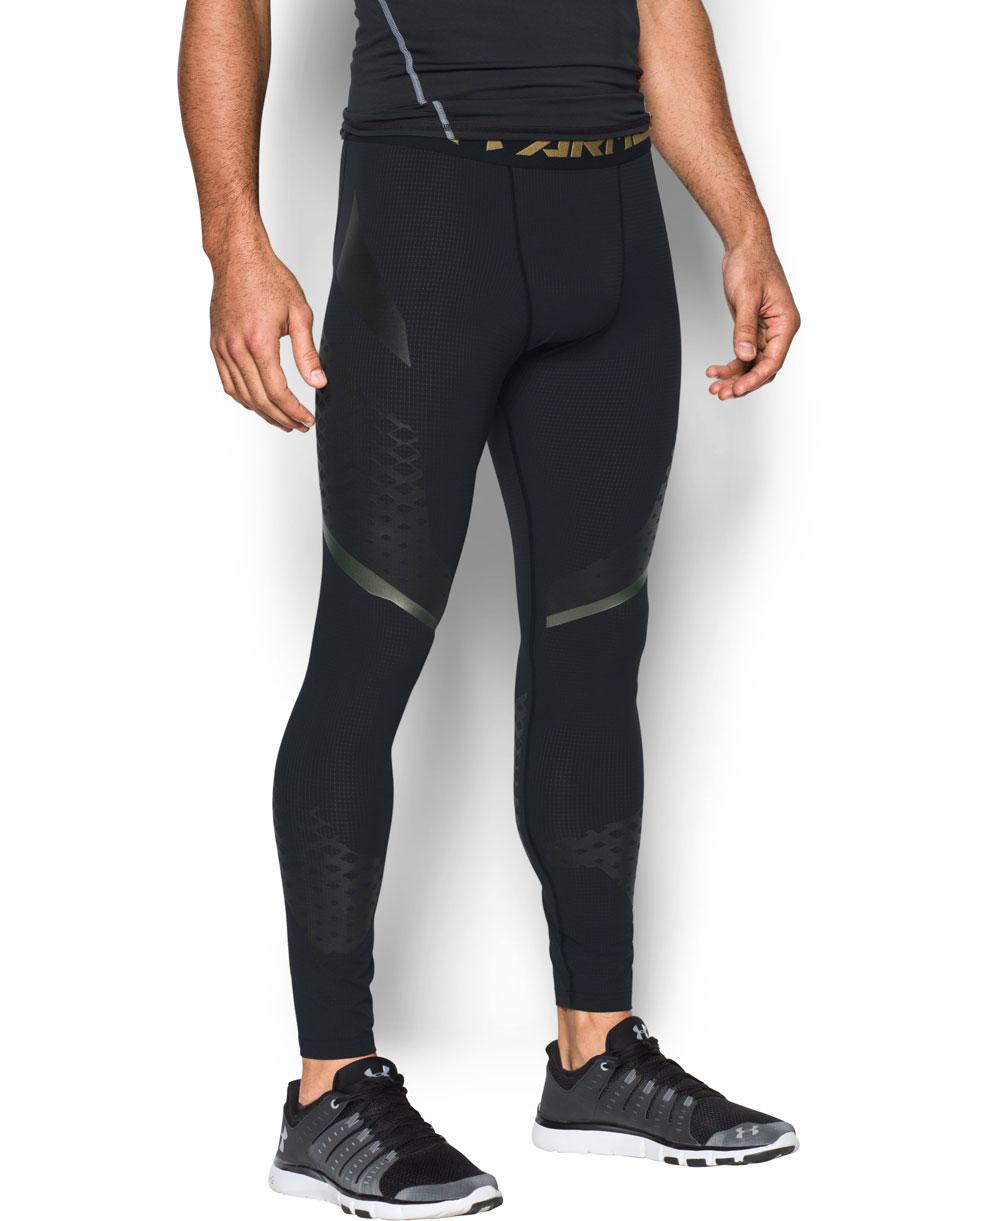 HeatGear Armour Zone Men's Leggings Black